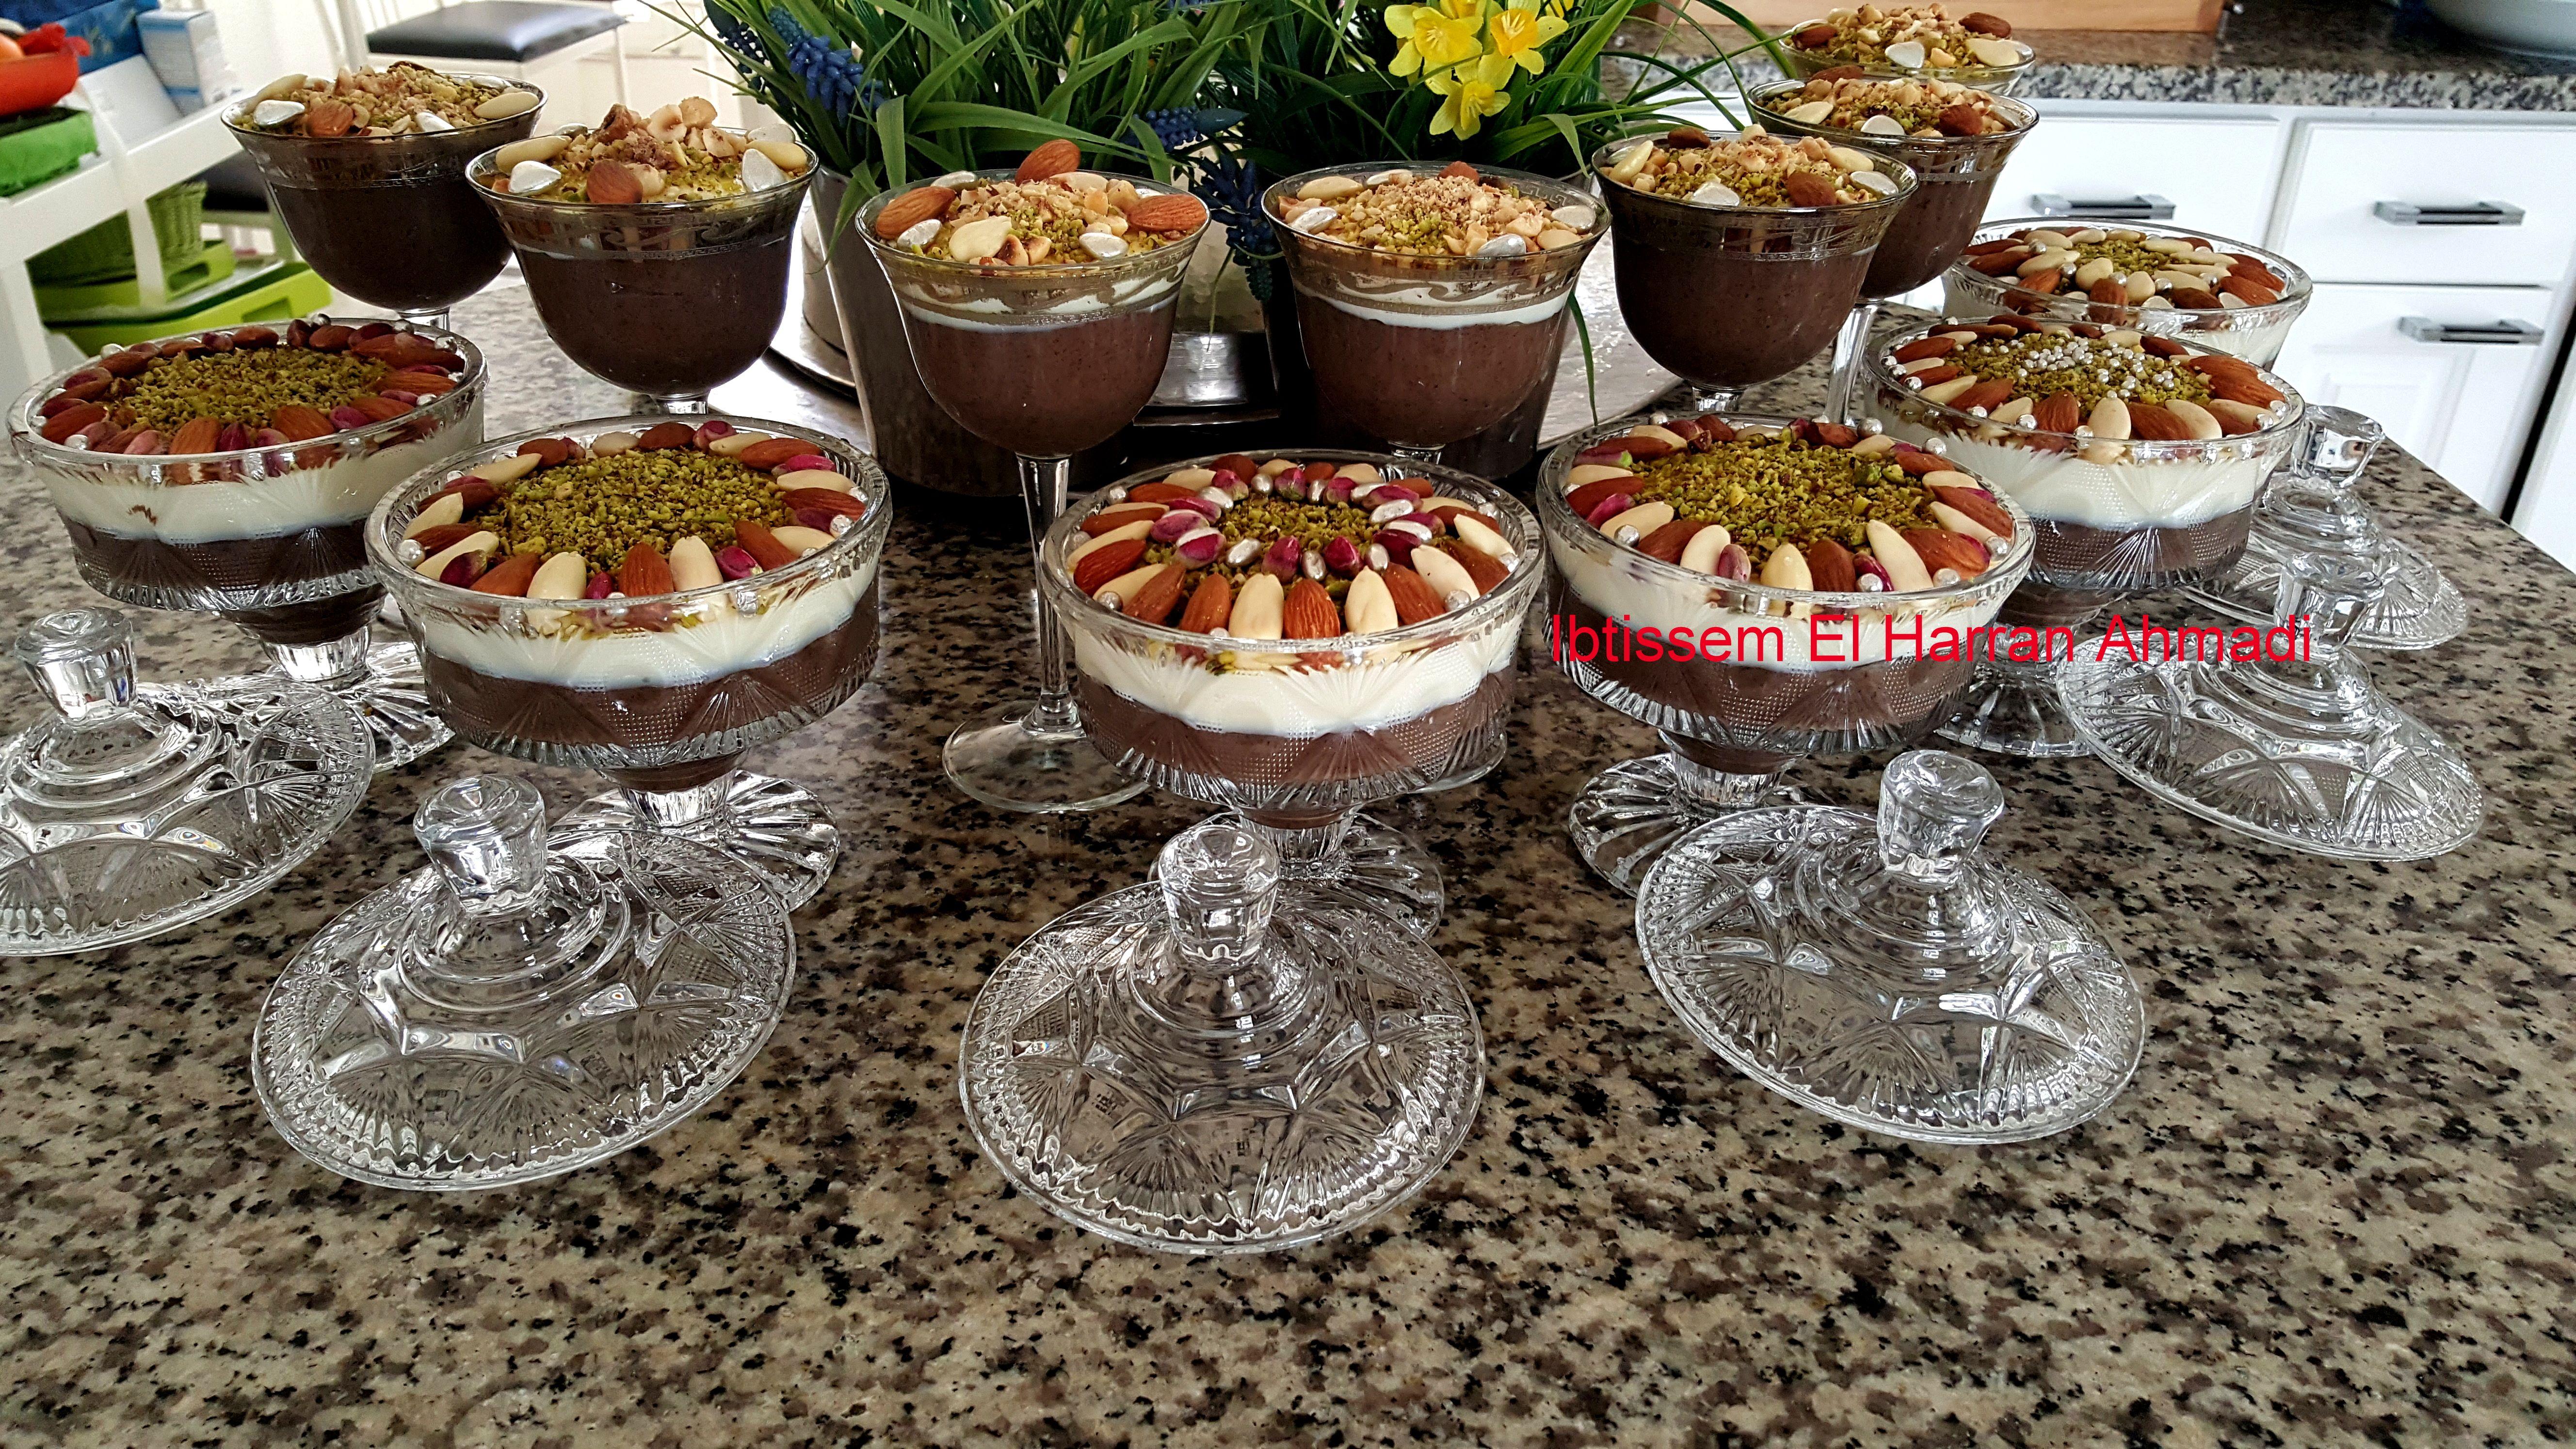 Une grande envie d'assida zgougou notre  fameuse et authentique ASSIDA ZGOUGOU  #cuisinetunisienne #assida #zgougou